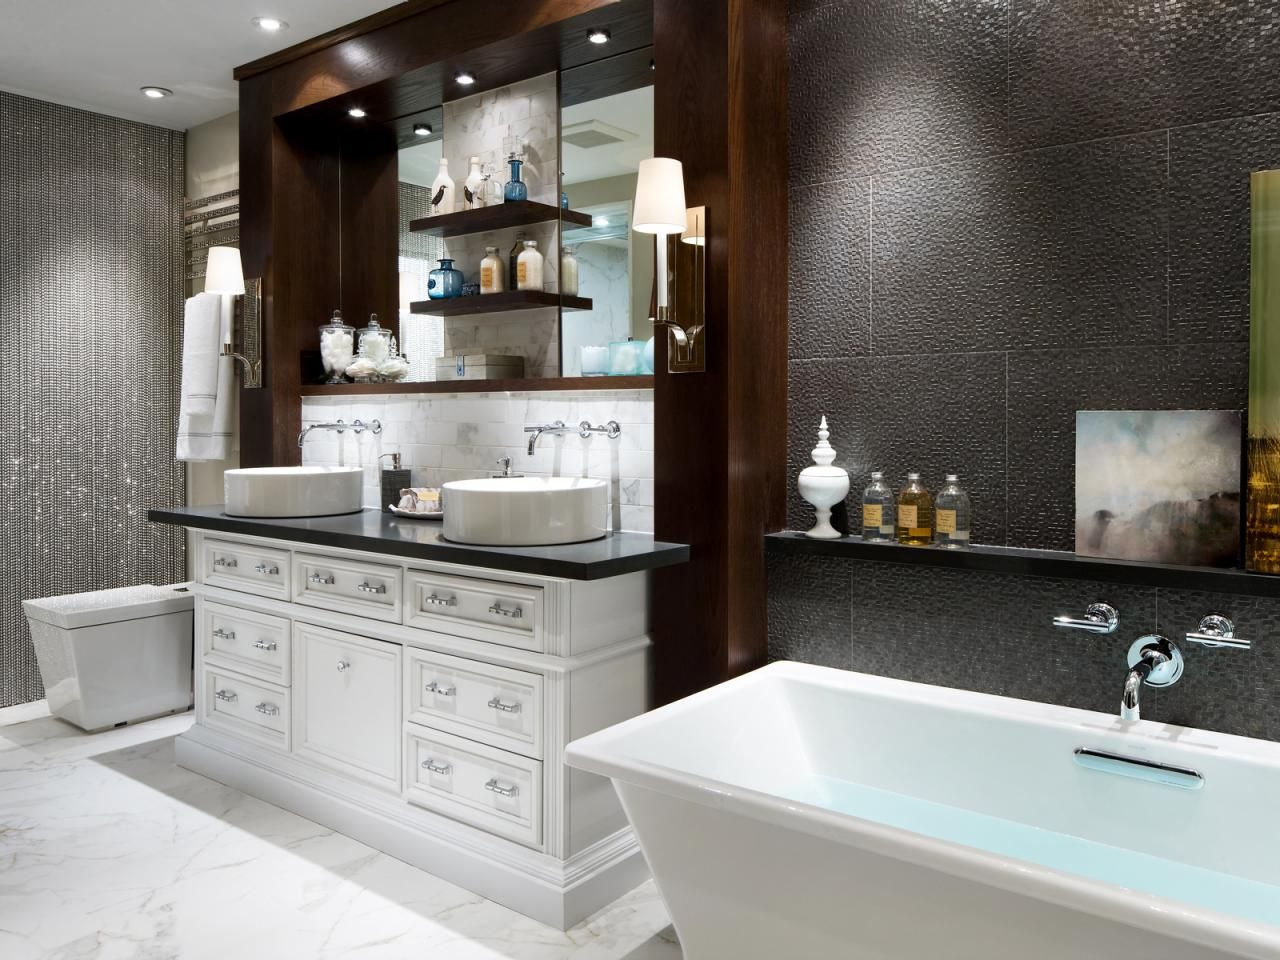 Candice Olson Bathroom Design 20 Luxurious Bathroom Makeovers From Our Stars  Candice Olson